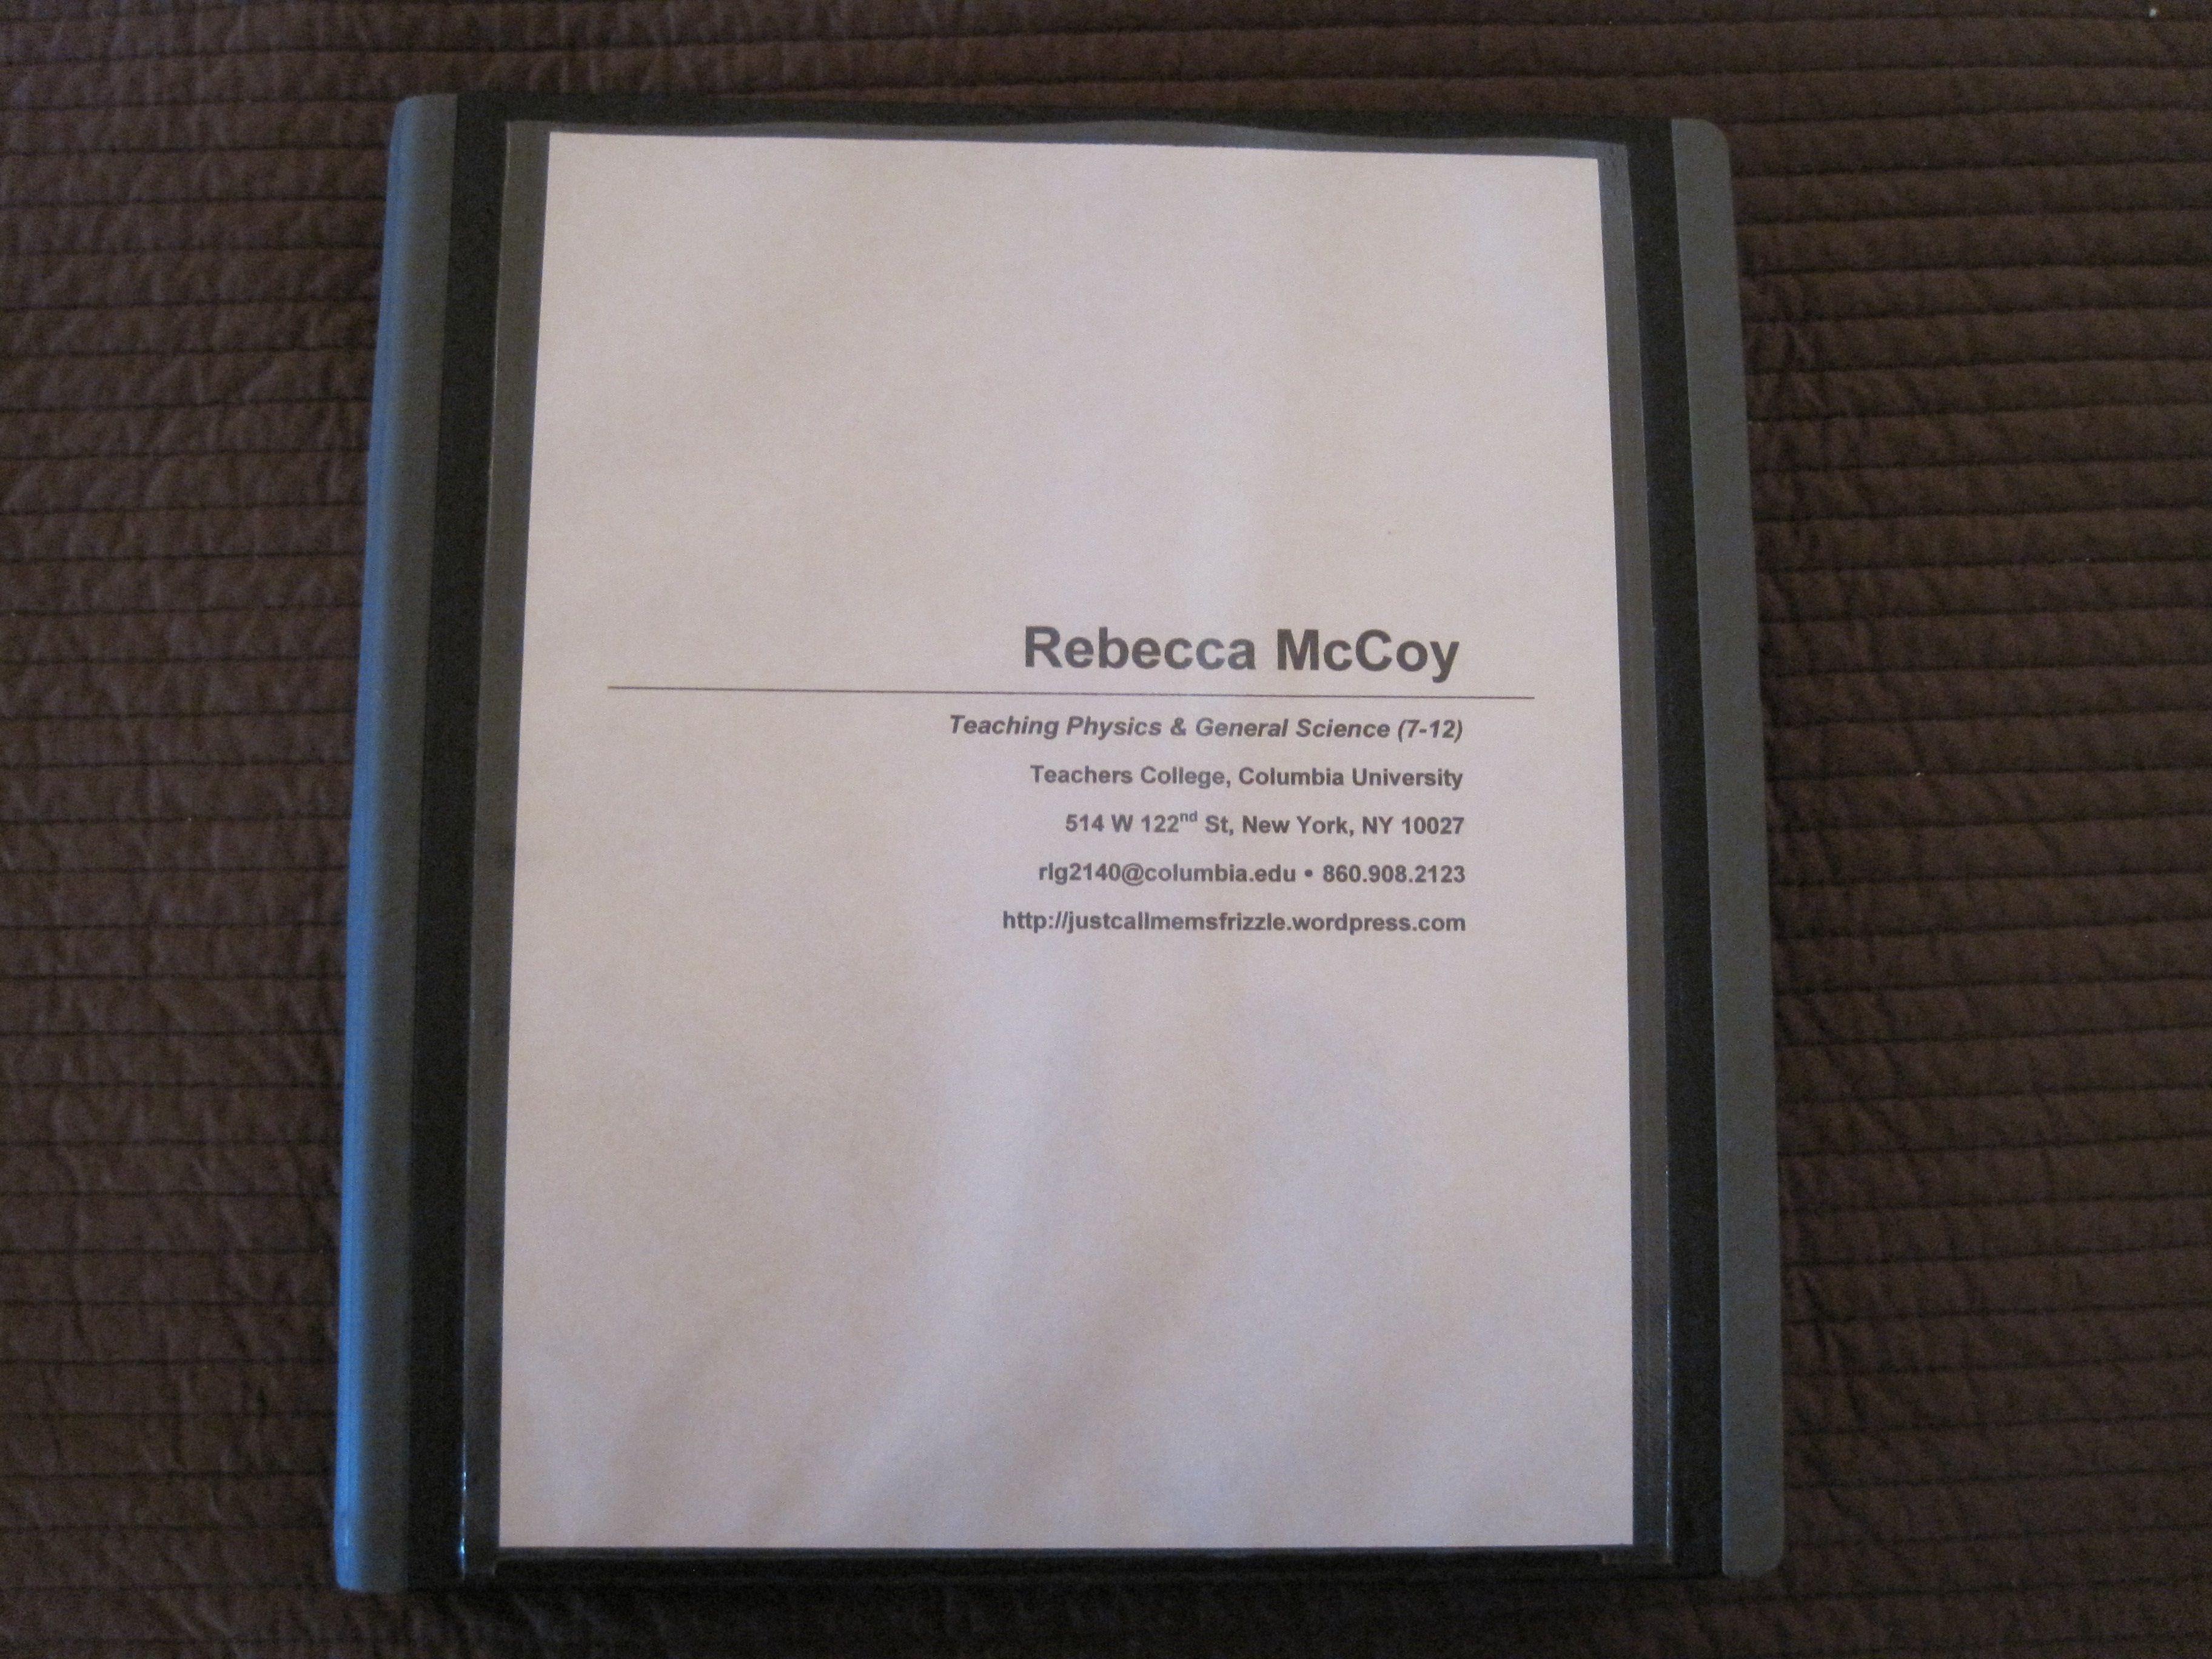 My Teaching Portfolio | Teaching portfolio and Teaching philosophy